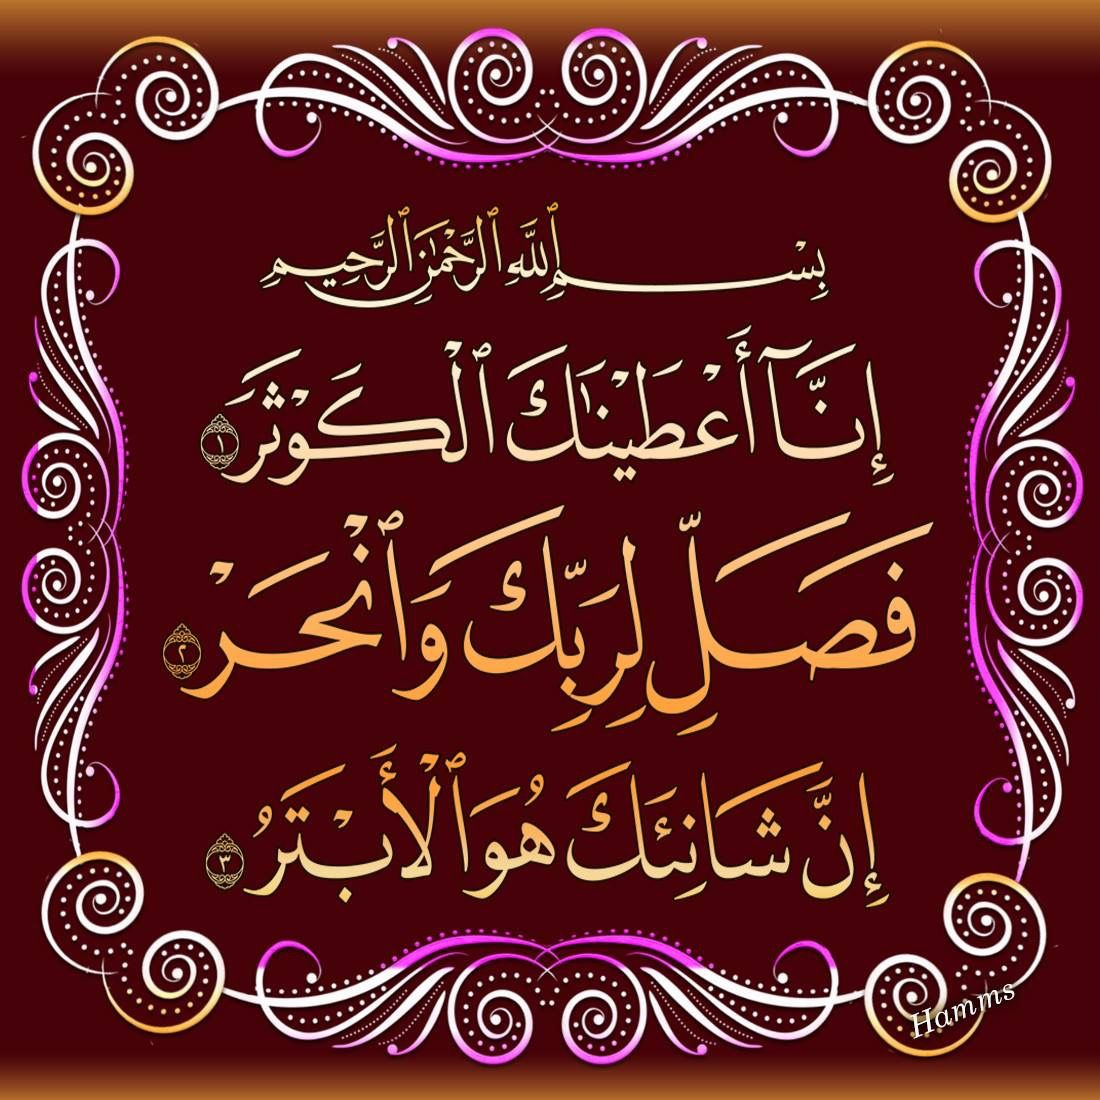 Pin By كتابا متشابها On ١٠٨ سورة الكوثر Arabic Calligraphy Qoutes Islamic Qoutes